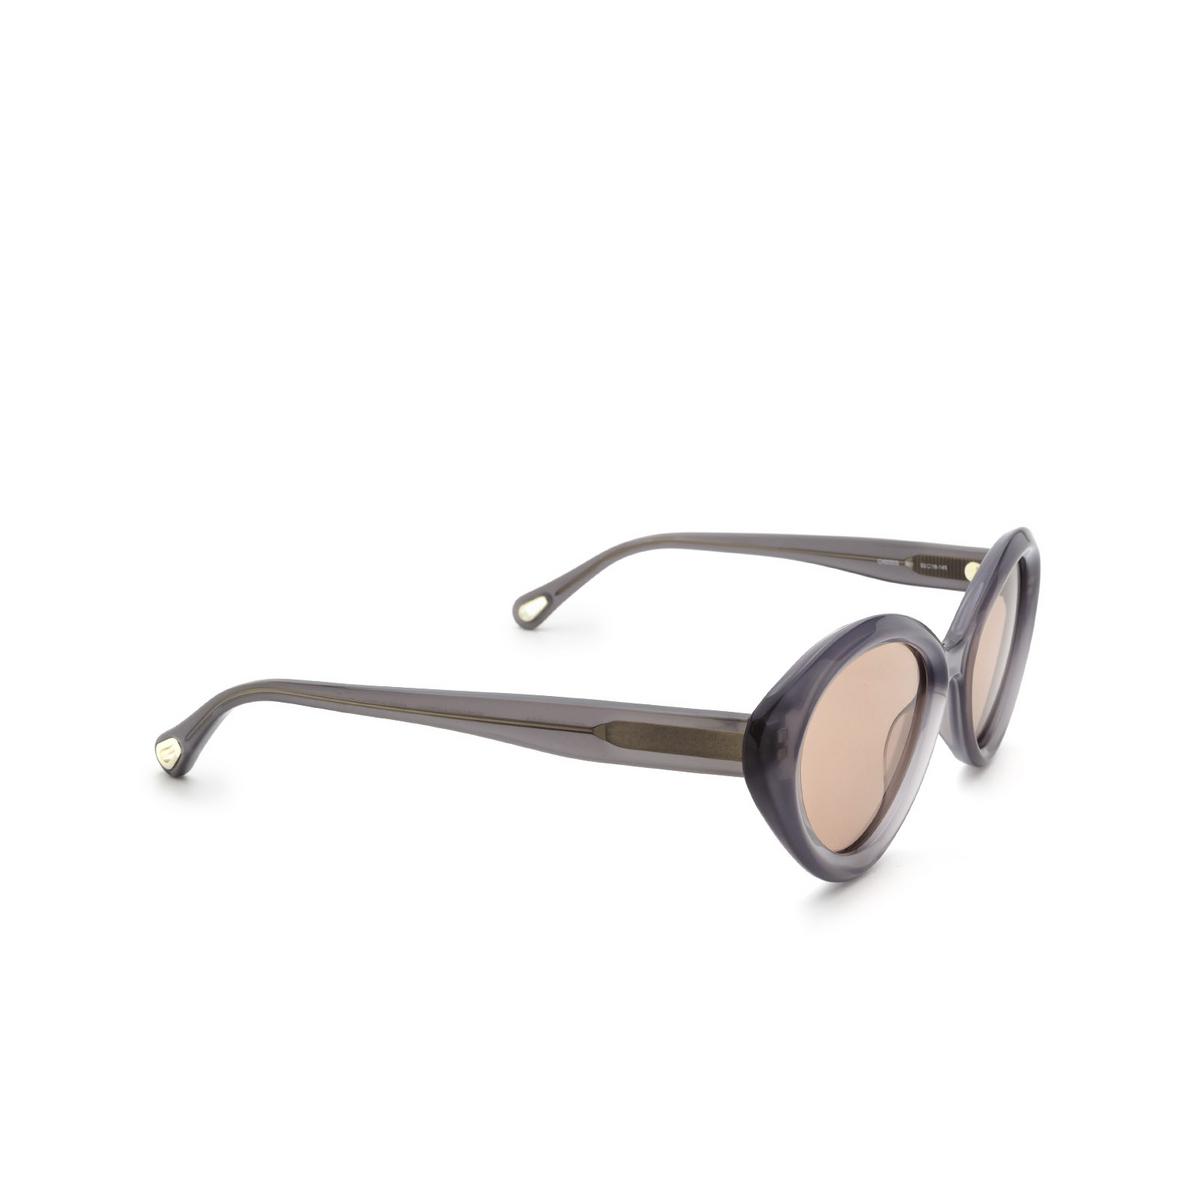 Chloé® Cat-eye Sunglasses: CH0050S color Grey 001 - three-quarters view.